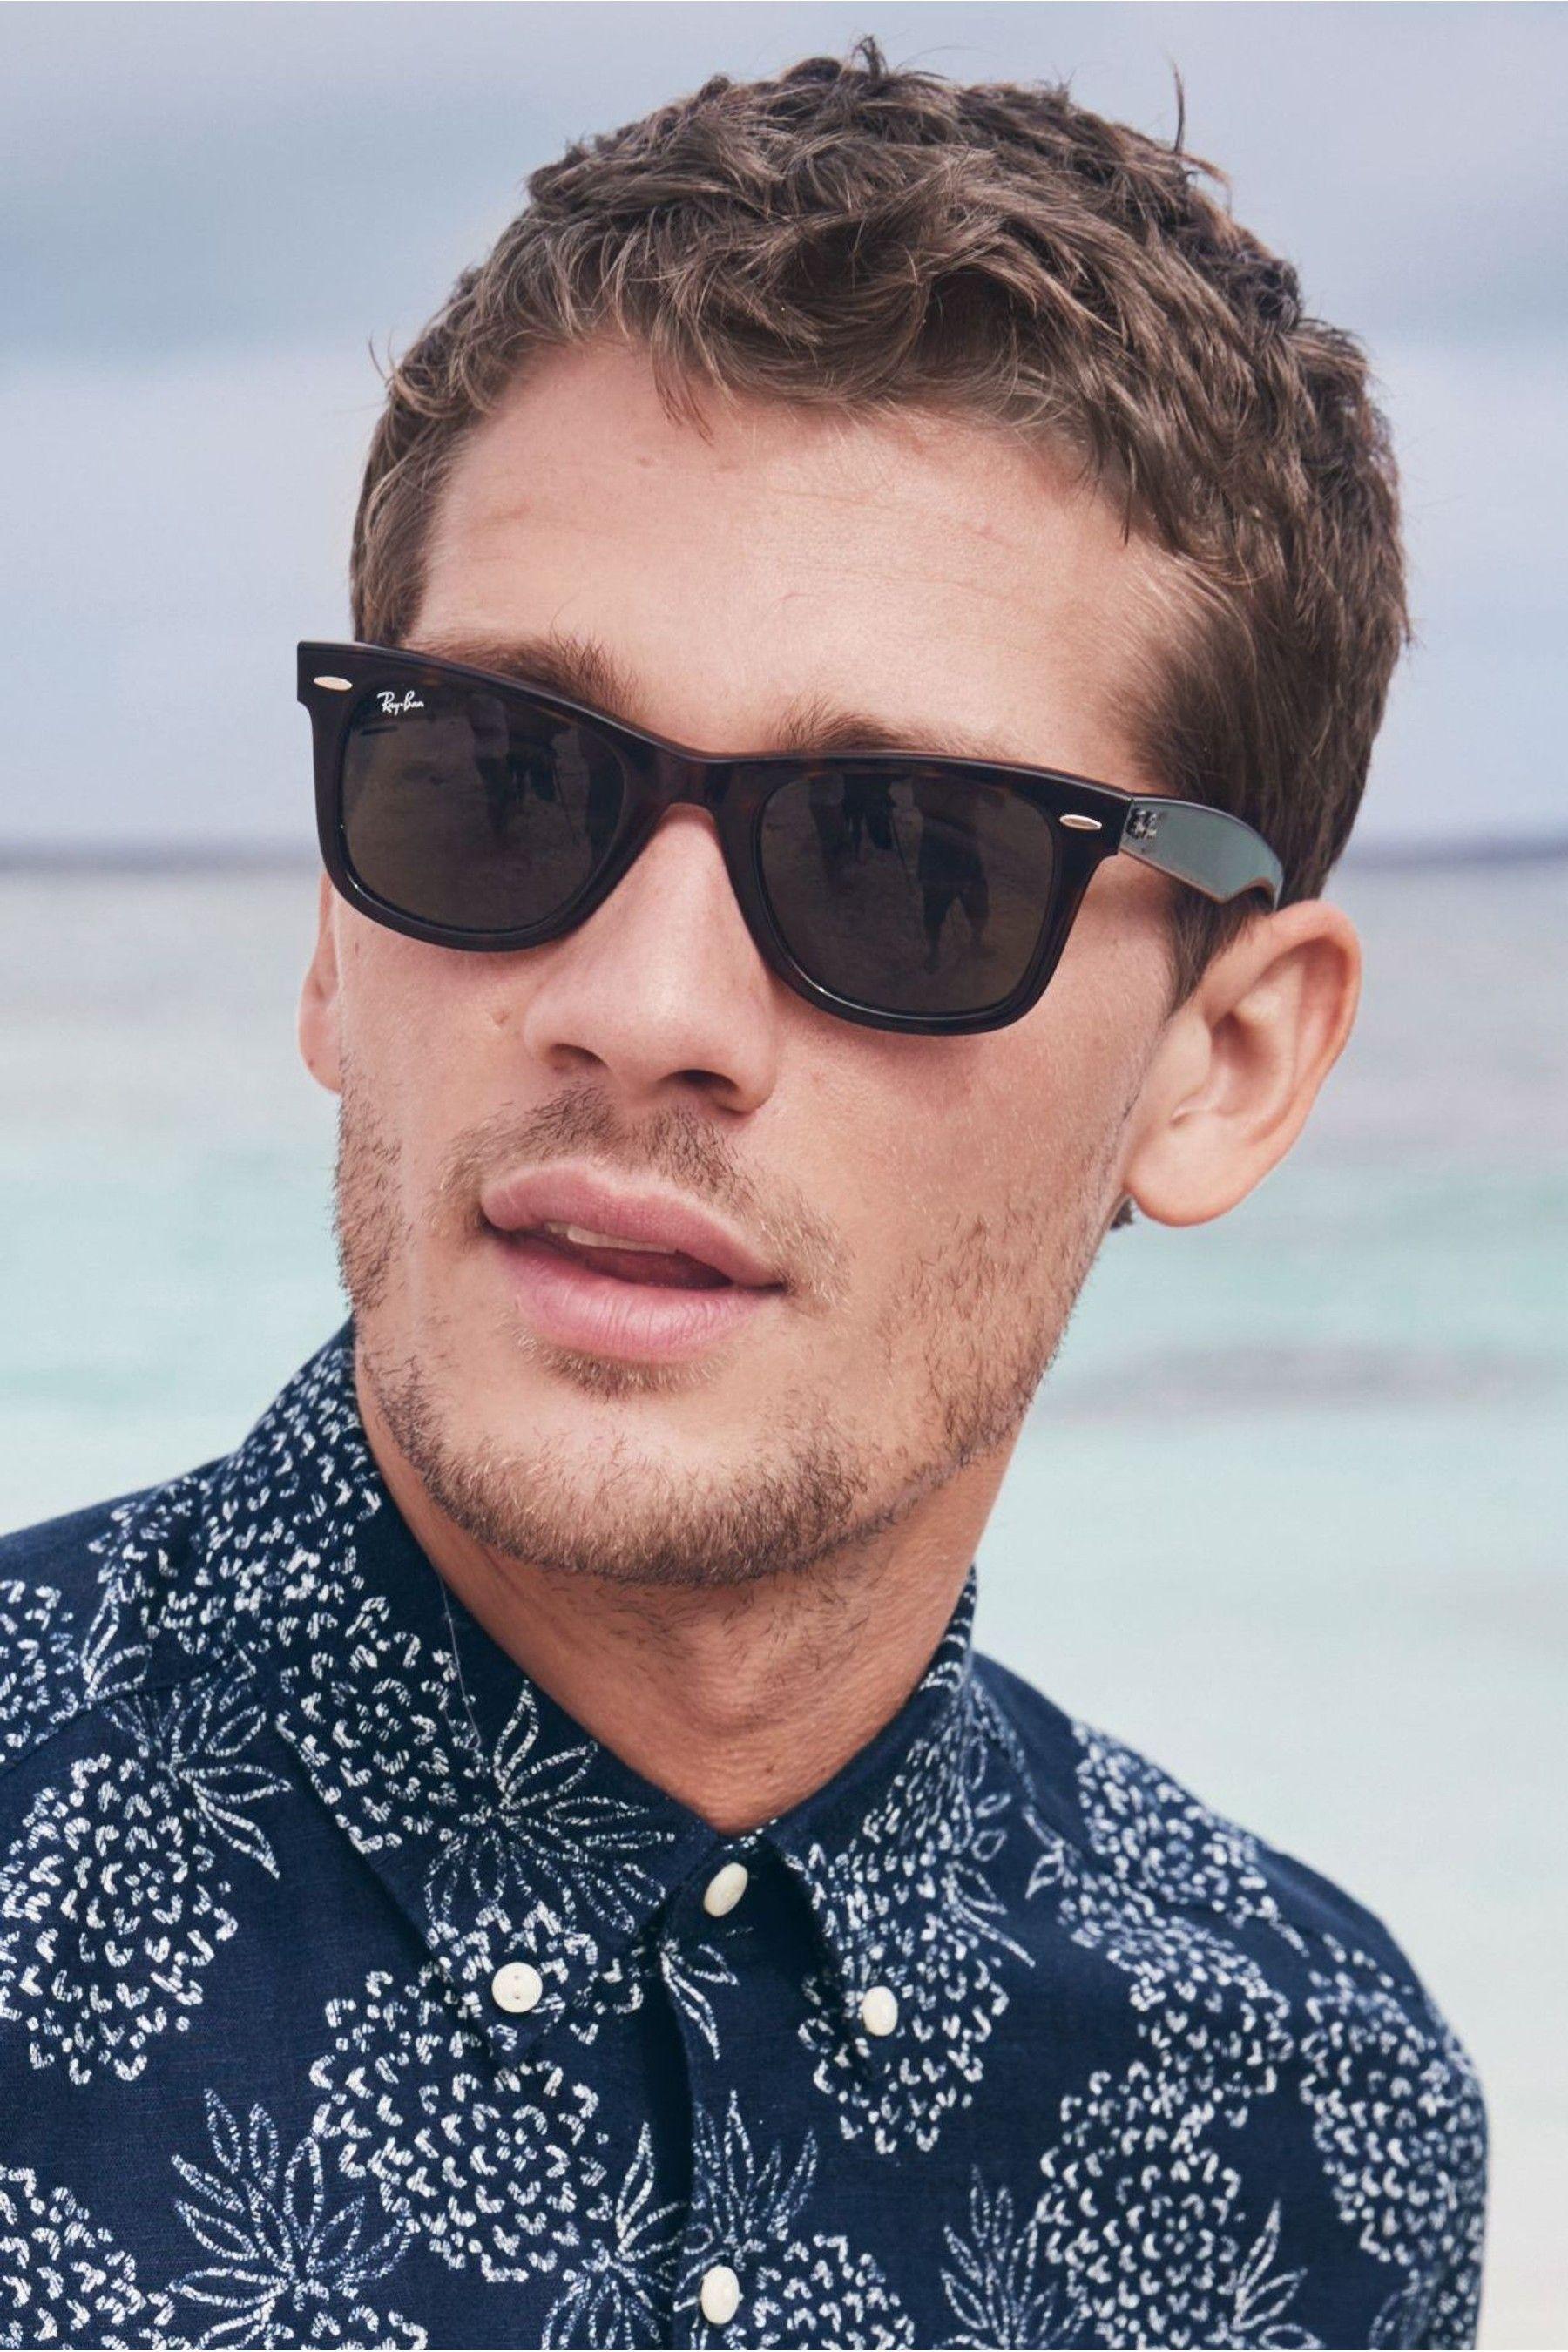 Wayfarer Sunglasses Sunglasses Womens Ray Ban Black Wayfarer Sunglasses Black In 2020 Black Wayfarer Black Wayfarer Sunglasses Wayfarer Sunglasses